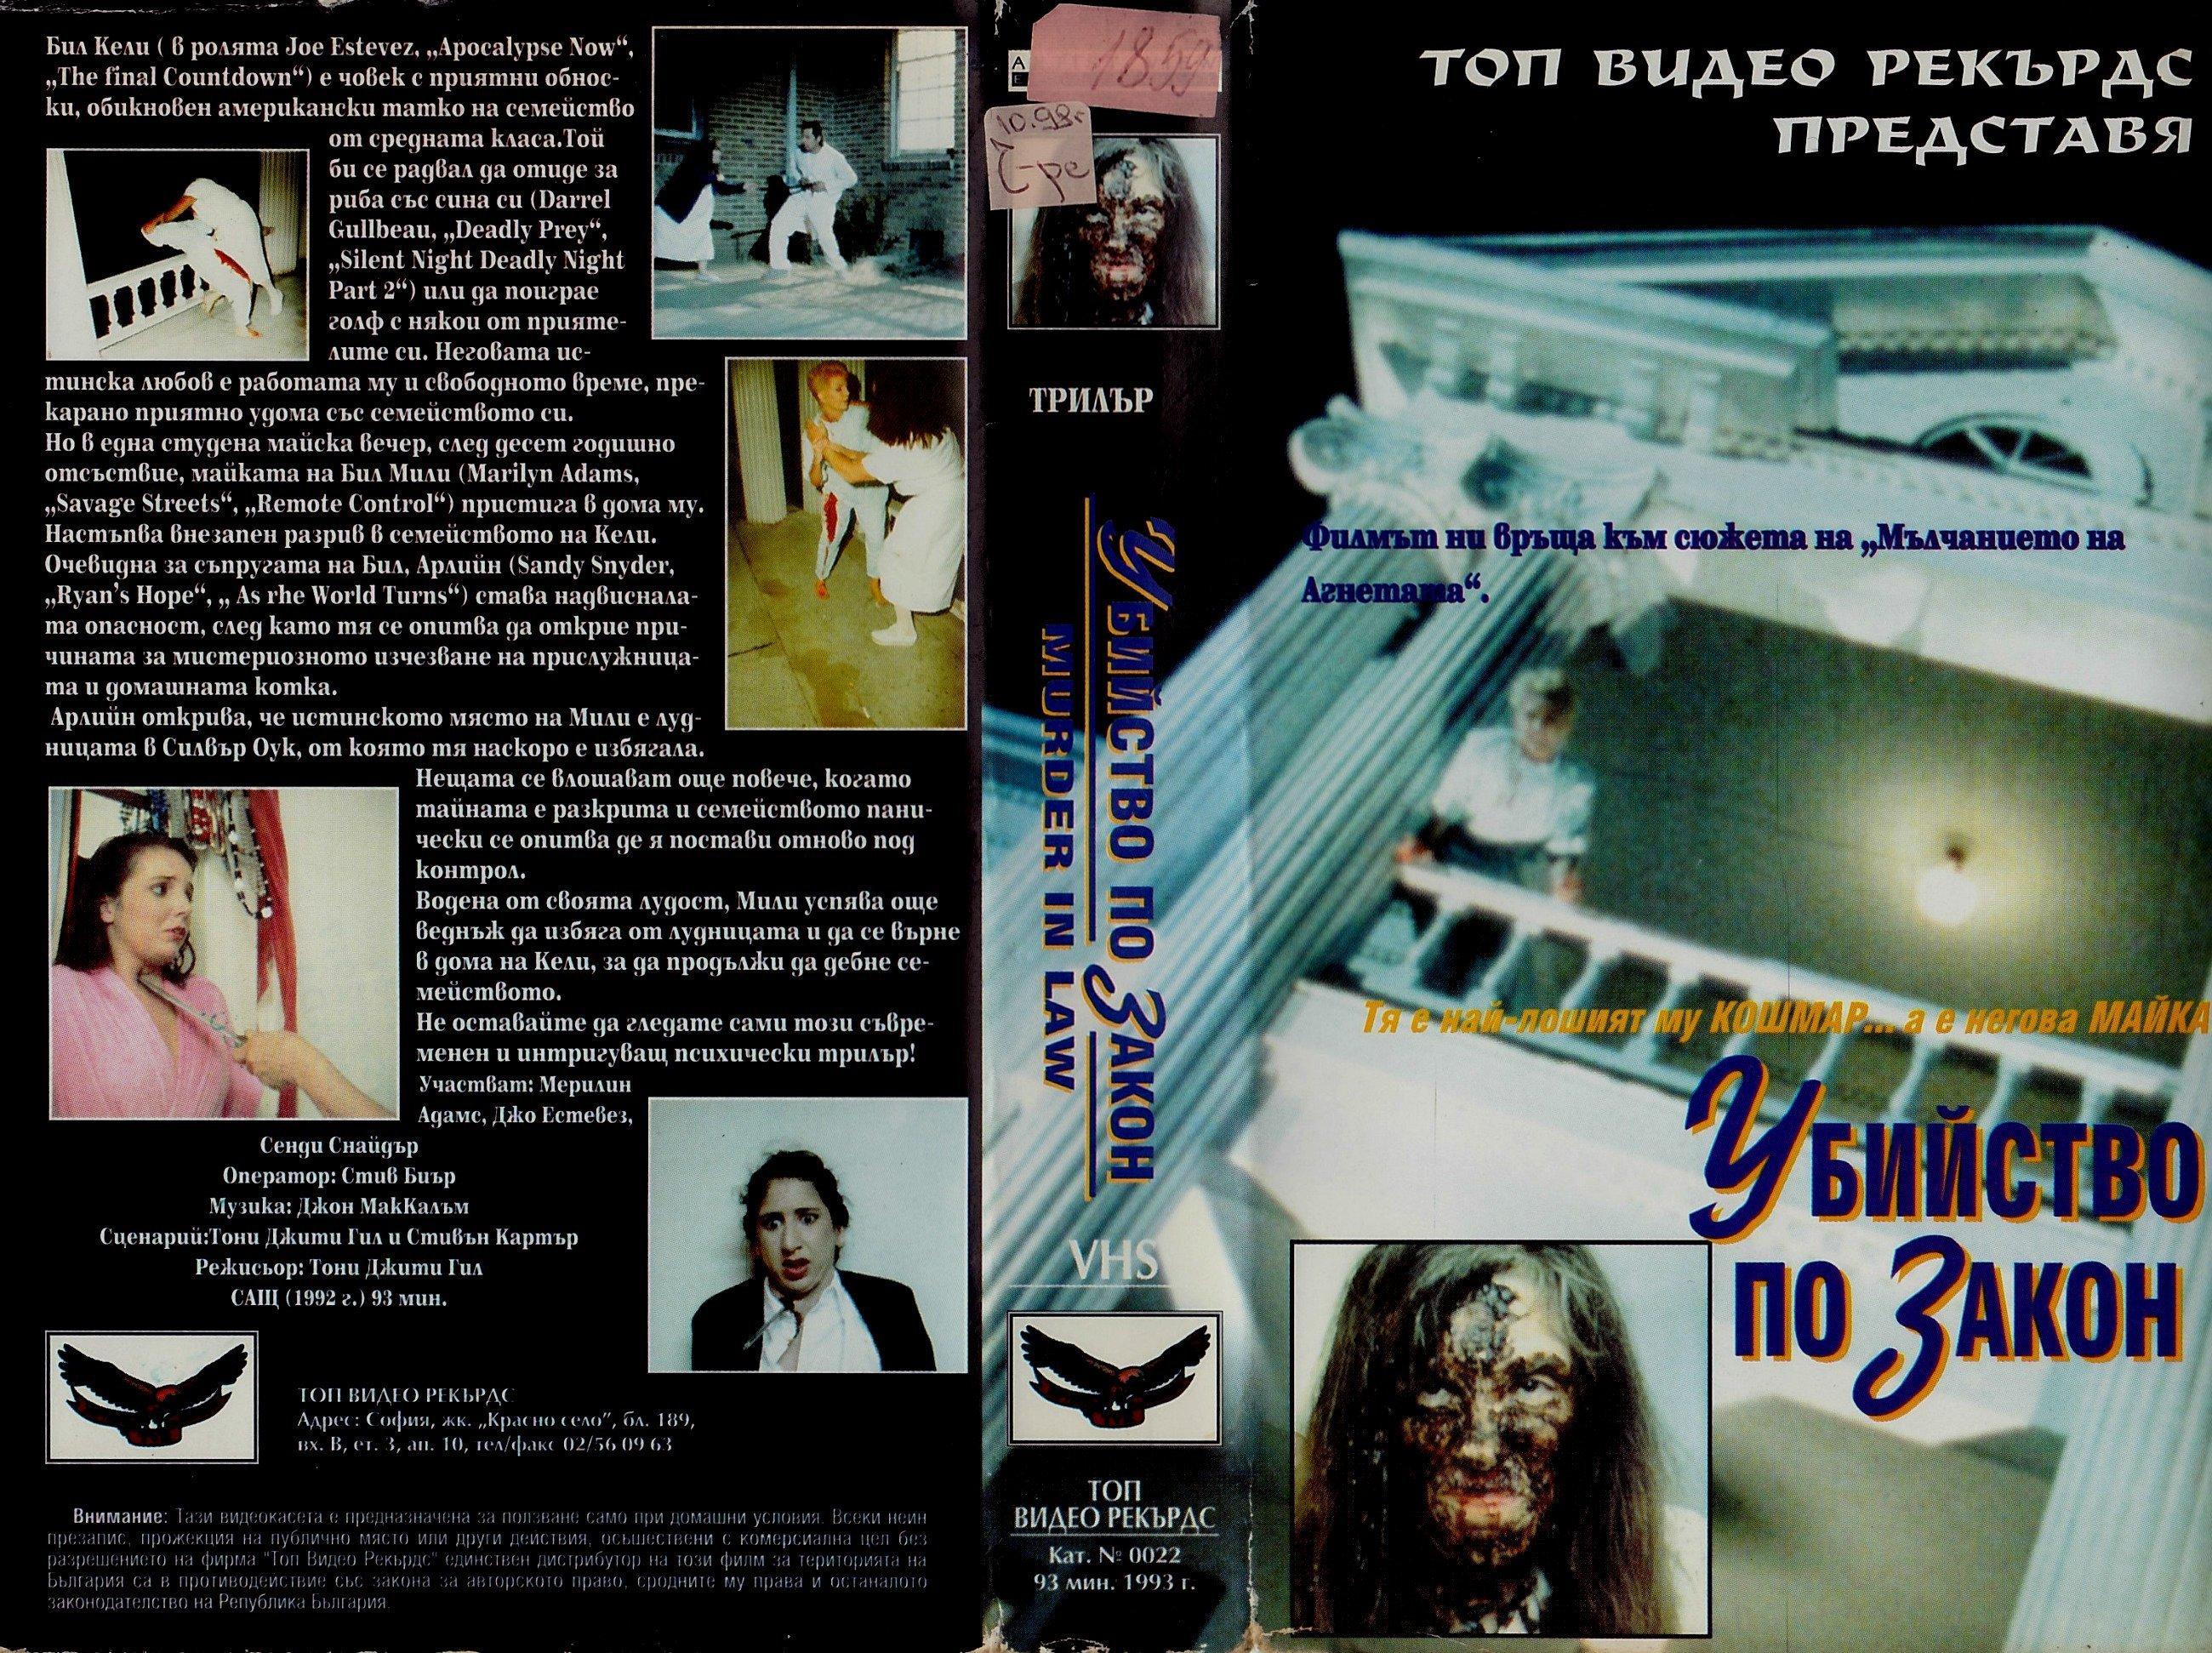 Убийство по закон филм постер